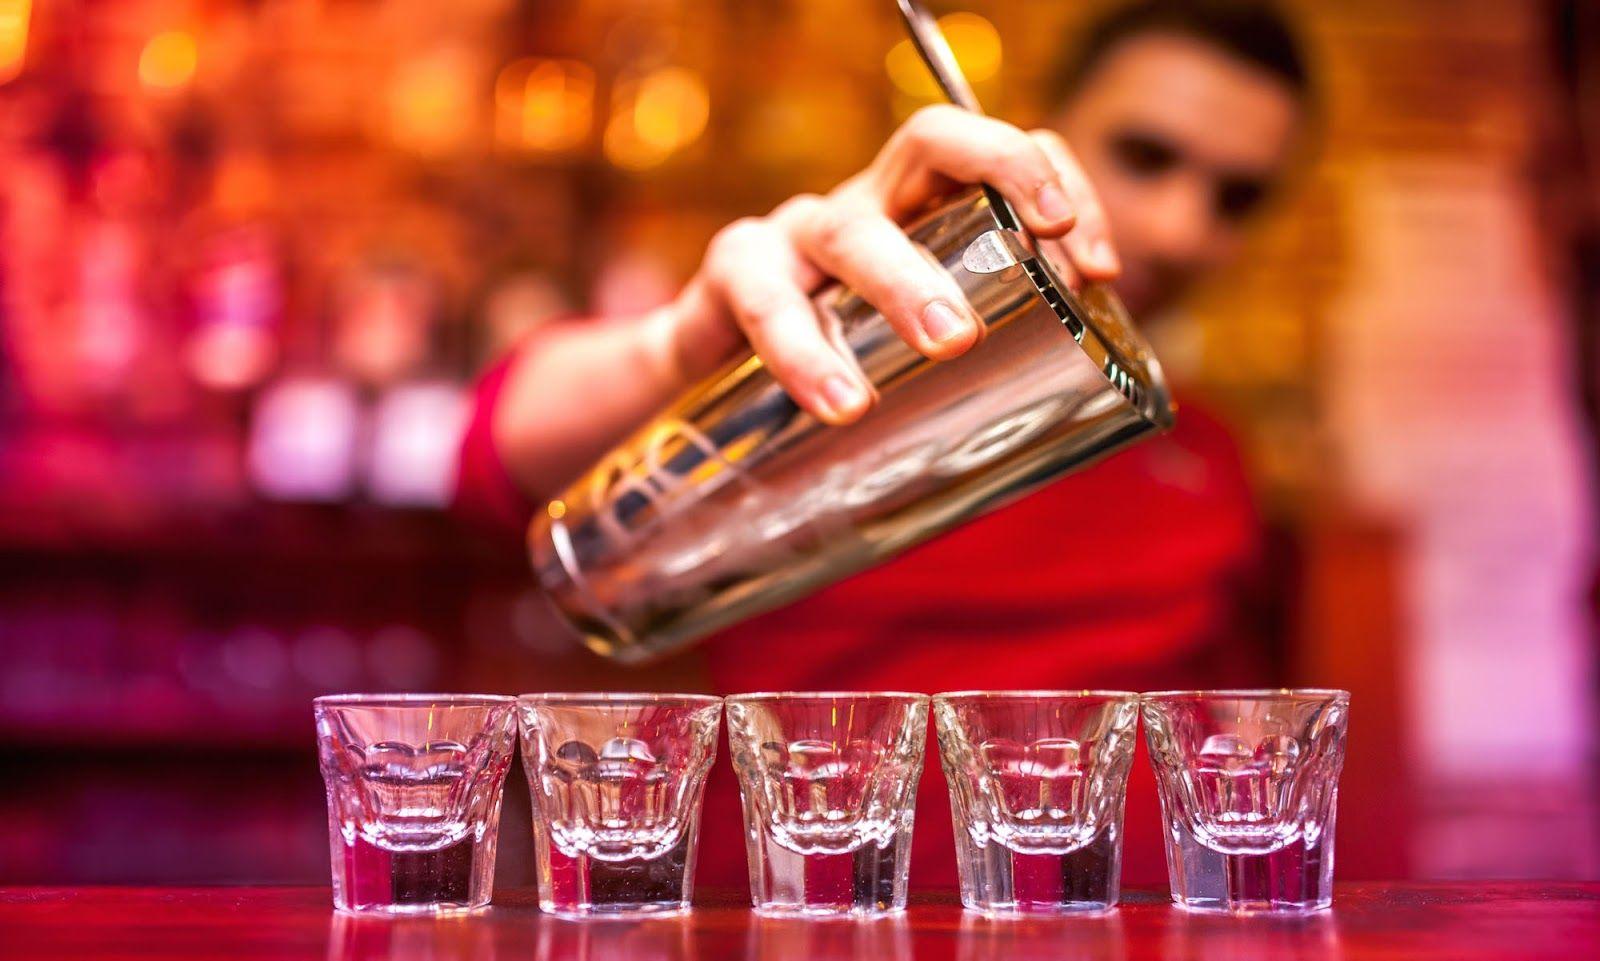 Pin By Arrestedworld On Travel Bartender Lemon Drop Shots Lemon Drop